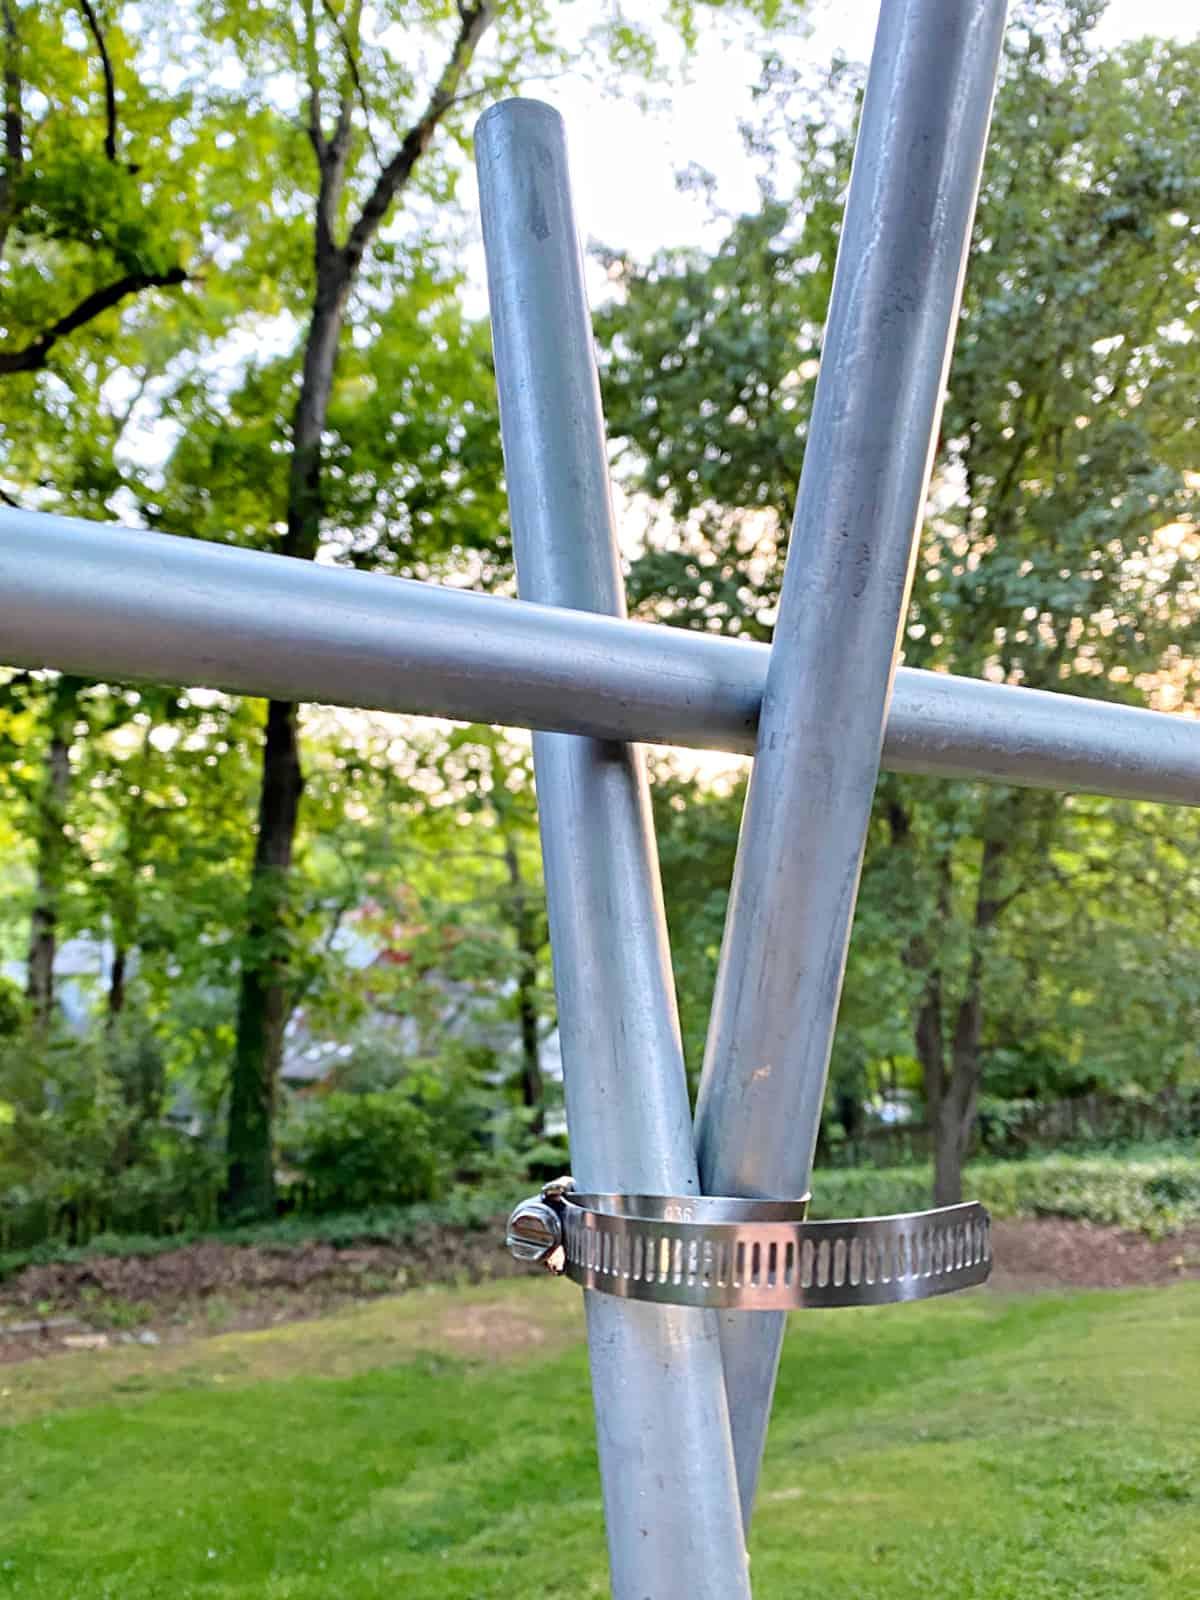 end of conduit pipe trellis